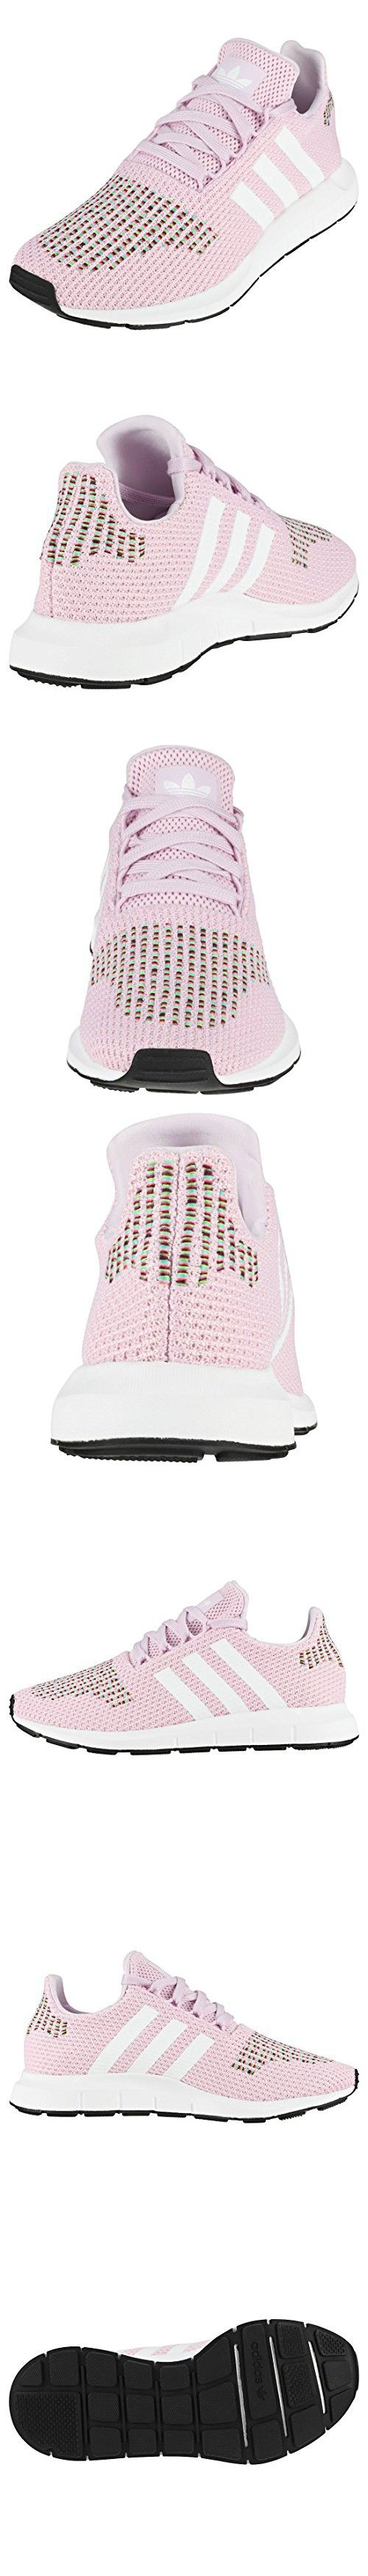 adidas swift womens trainers